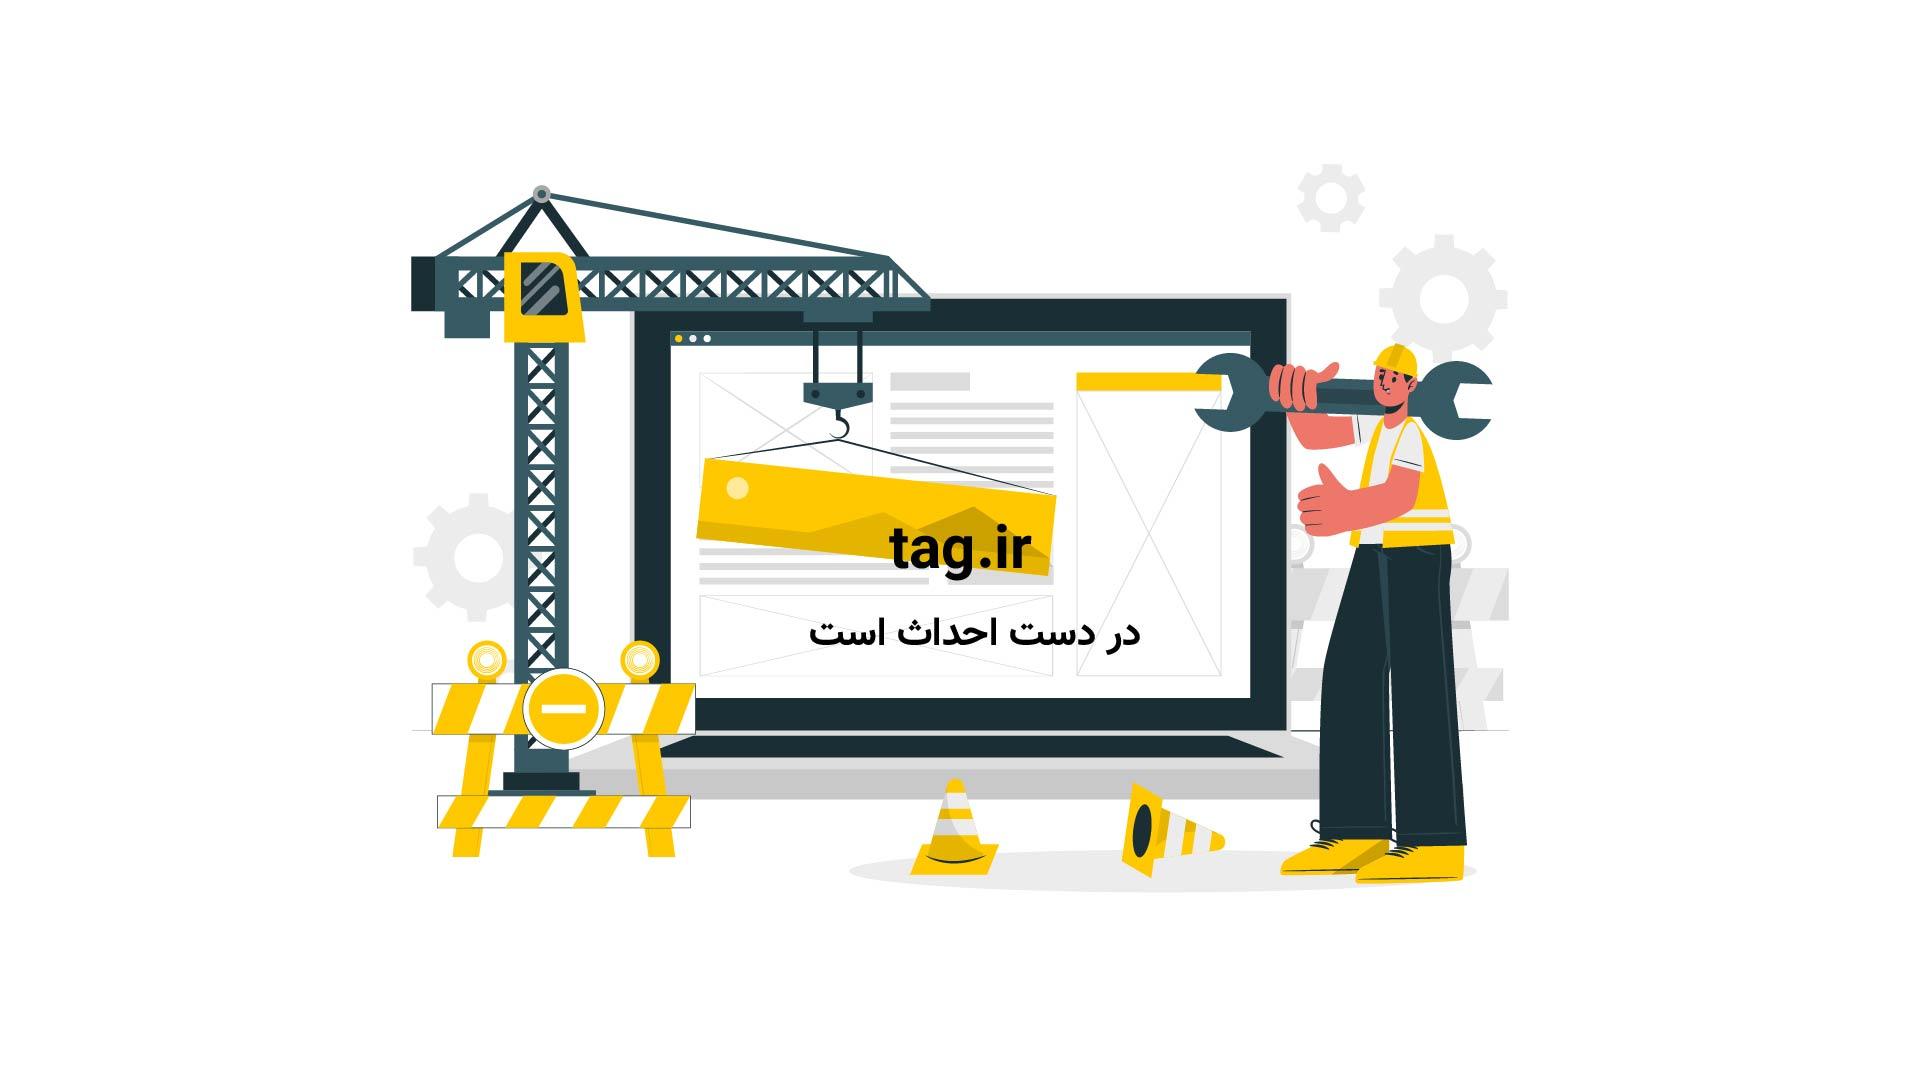 سریعترین خودروی جهان لکسوس | تگ